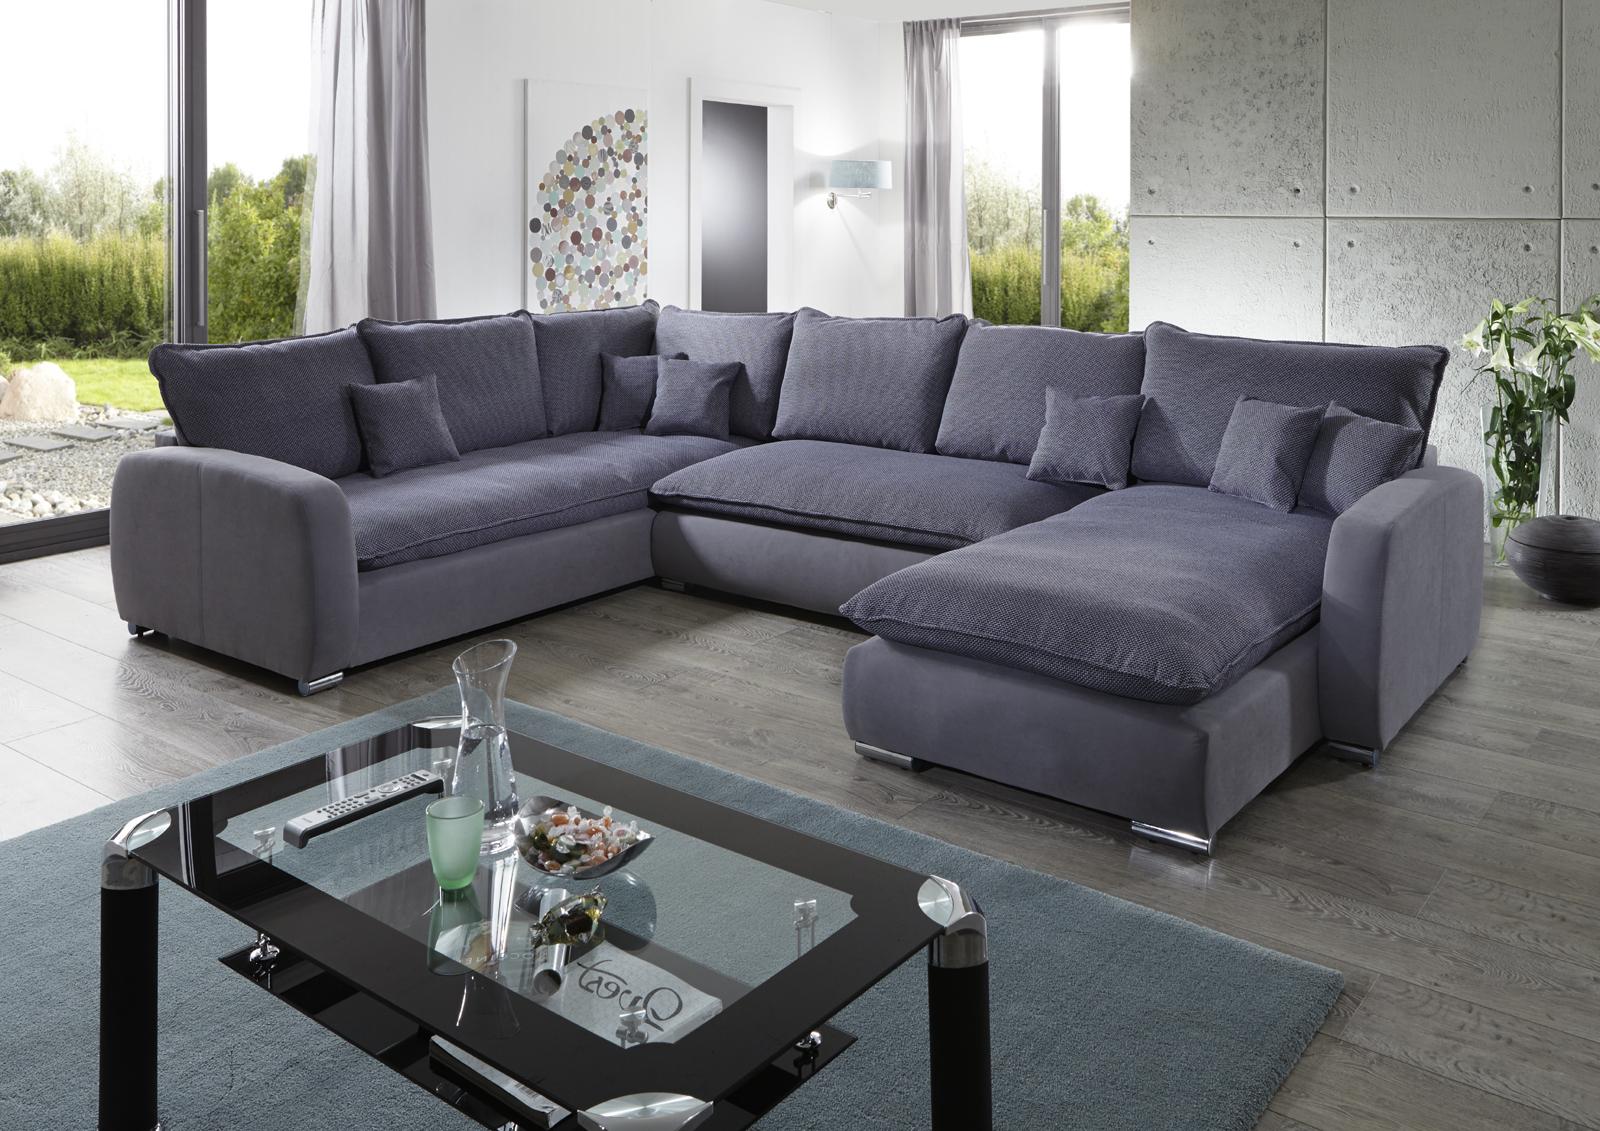 Sam sofa grau wohnlandschaft scala 230 cm x 350 x 180 cm for Couch wohnlandschaft